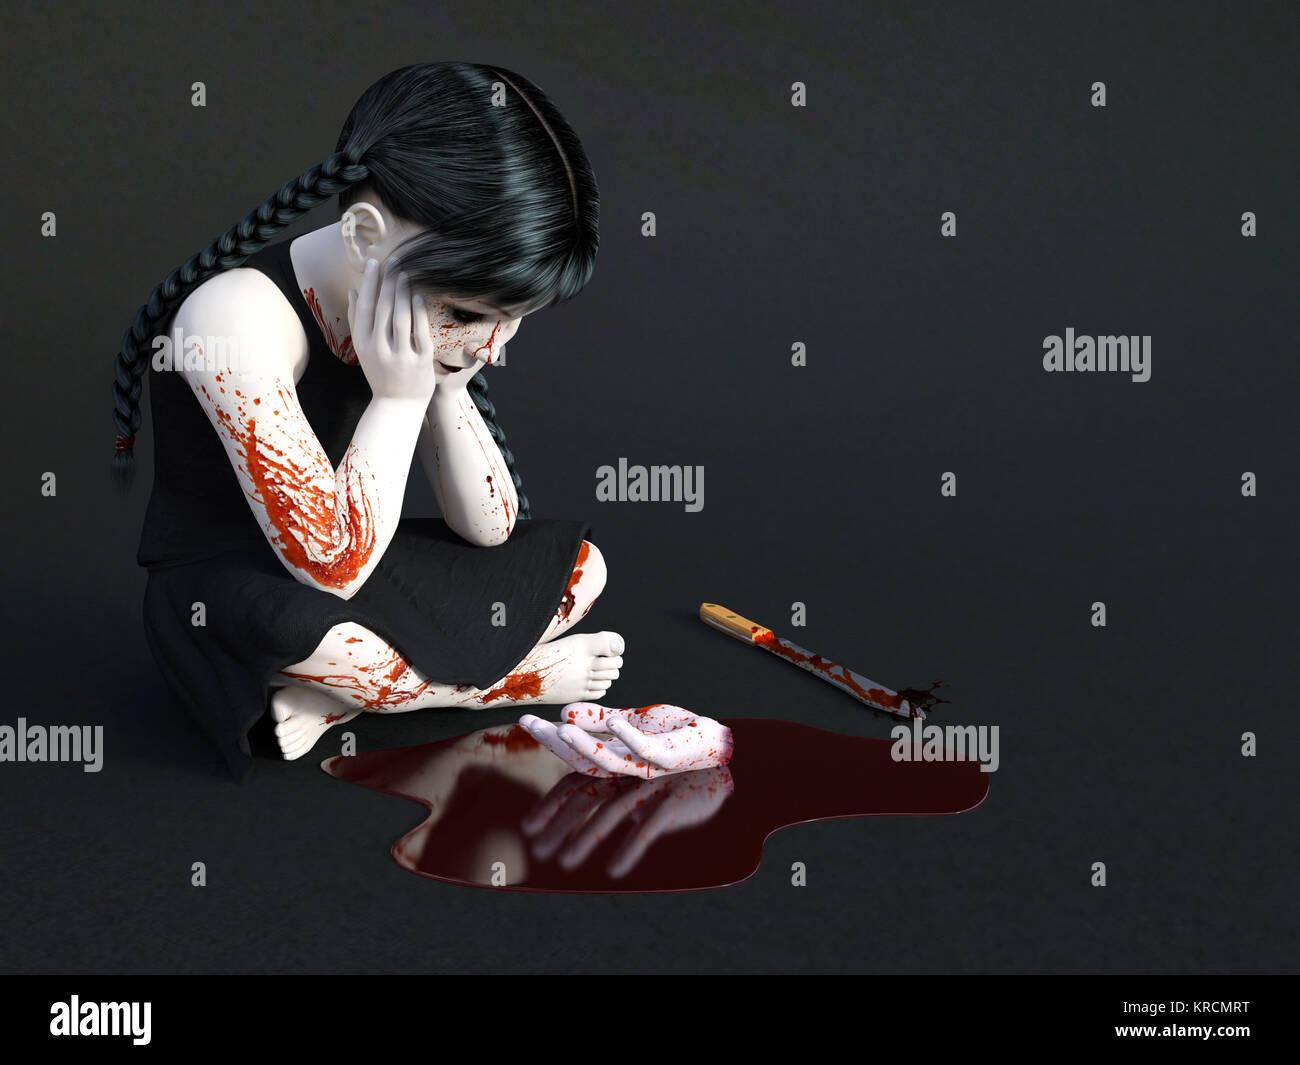 blood bleeding hand stock photos  u0026 blood bleeding hand stock images